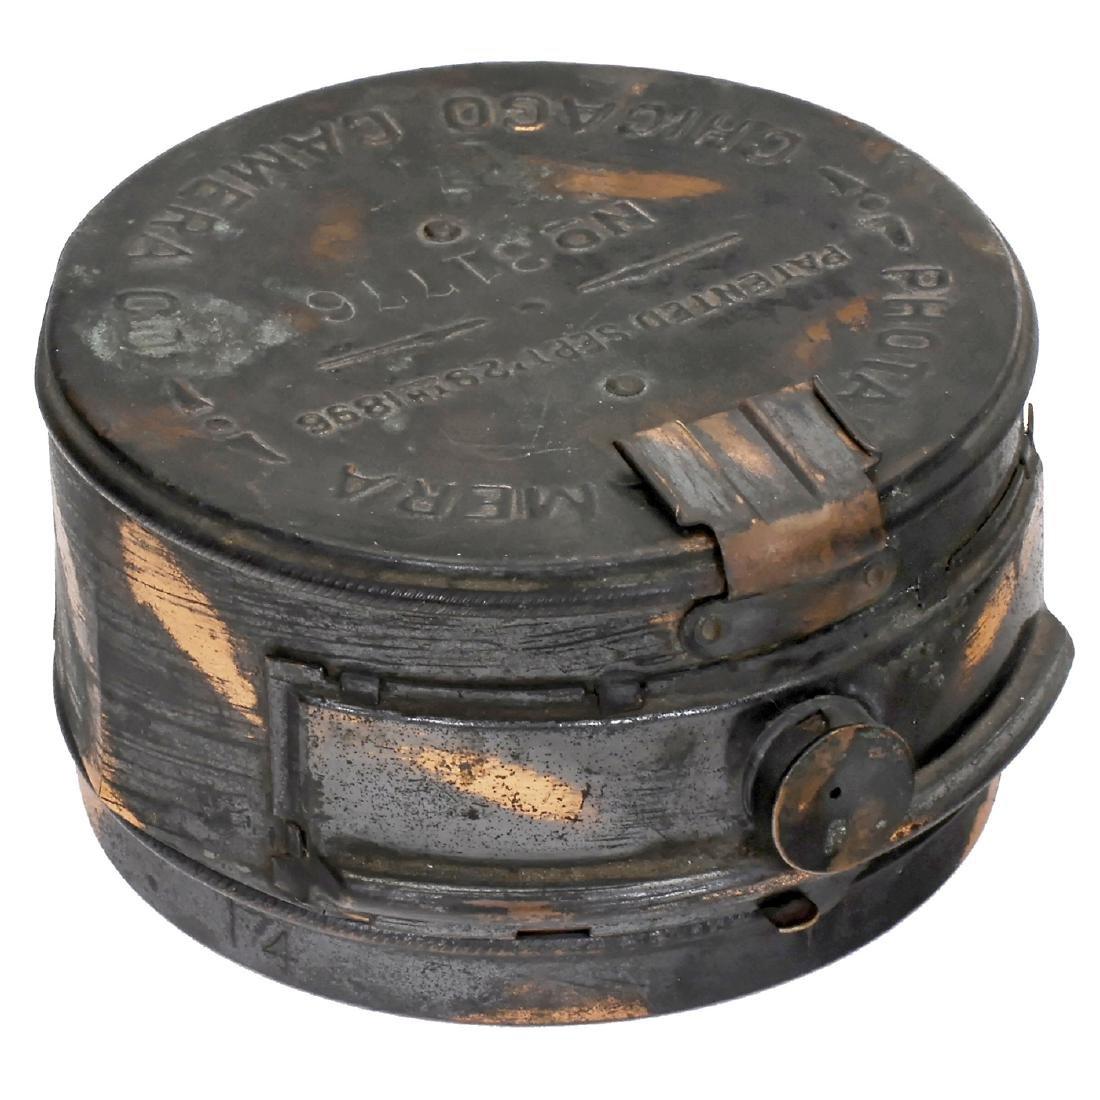 Photake Camera, 1896